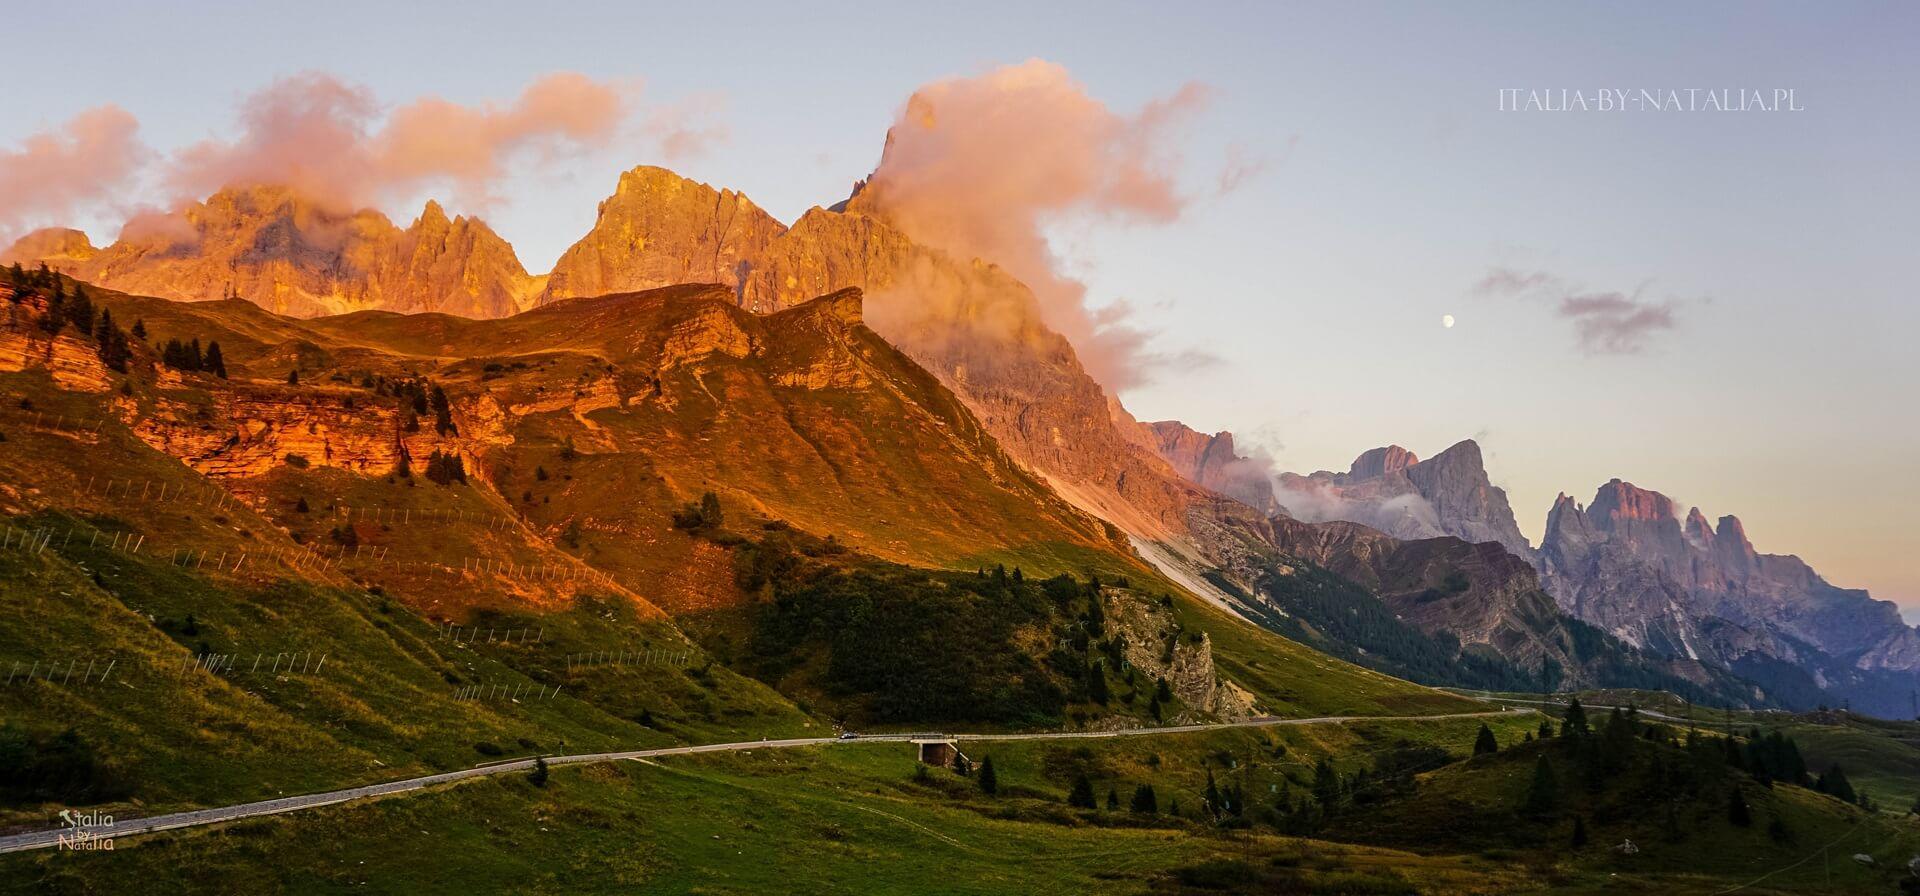 Cima Rosetta trekking Pale di San Martino Dolomity Dolomites Passo Rolle